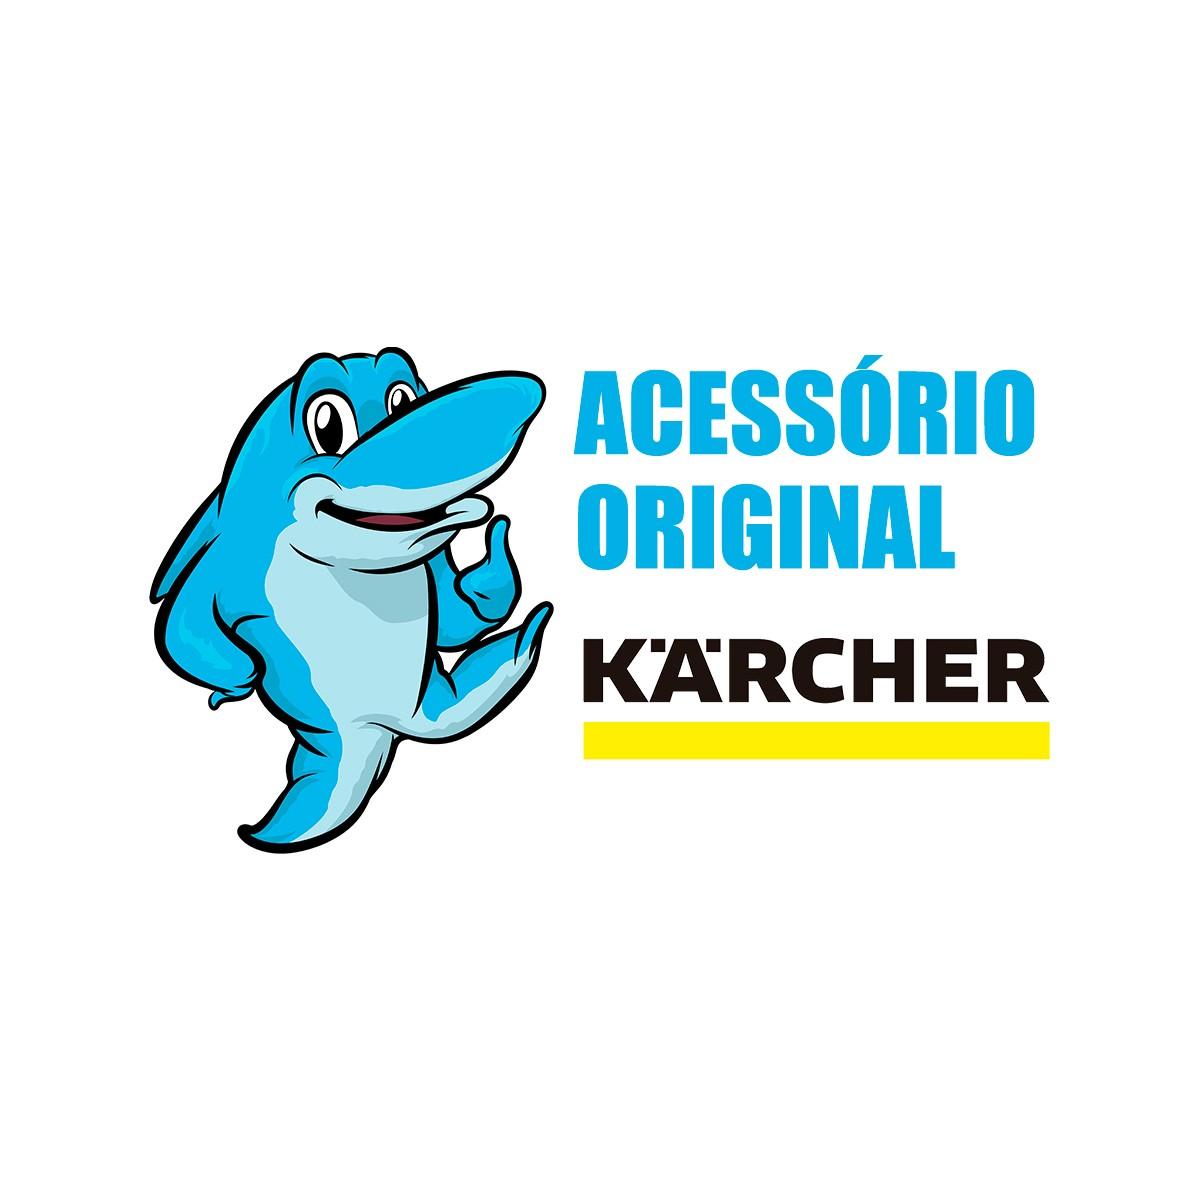 Filtro Permanente Original Karcher para Aspiradores NT20/1